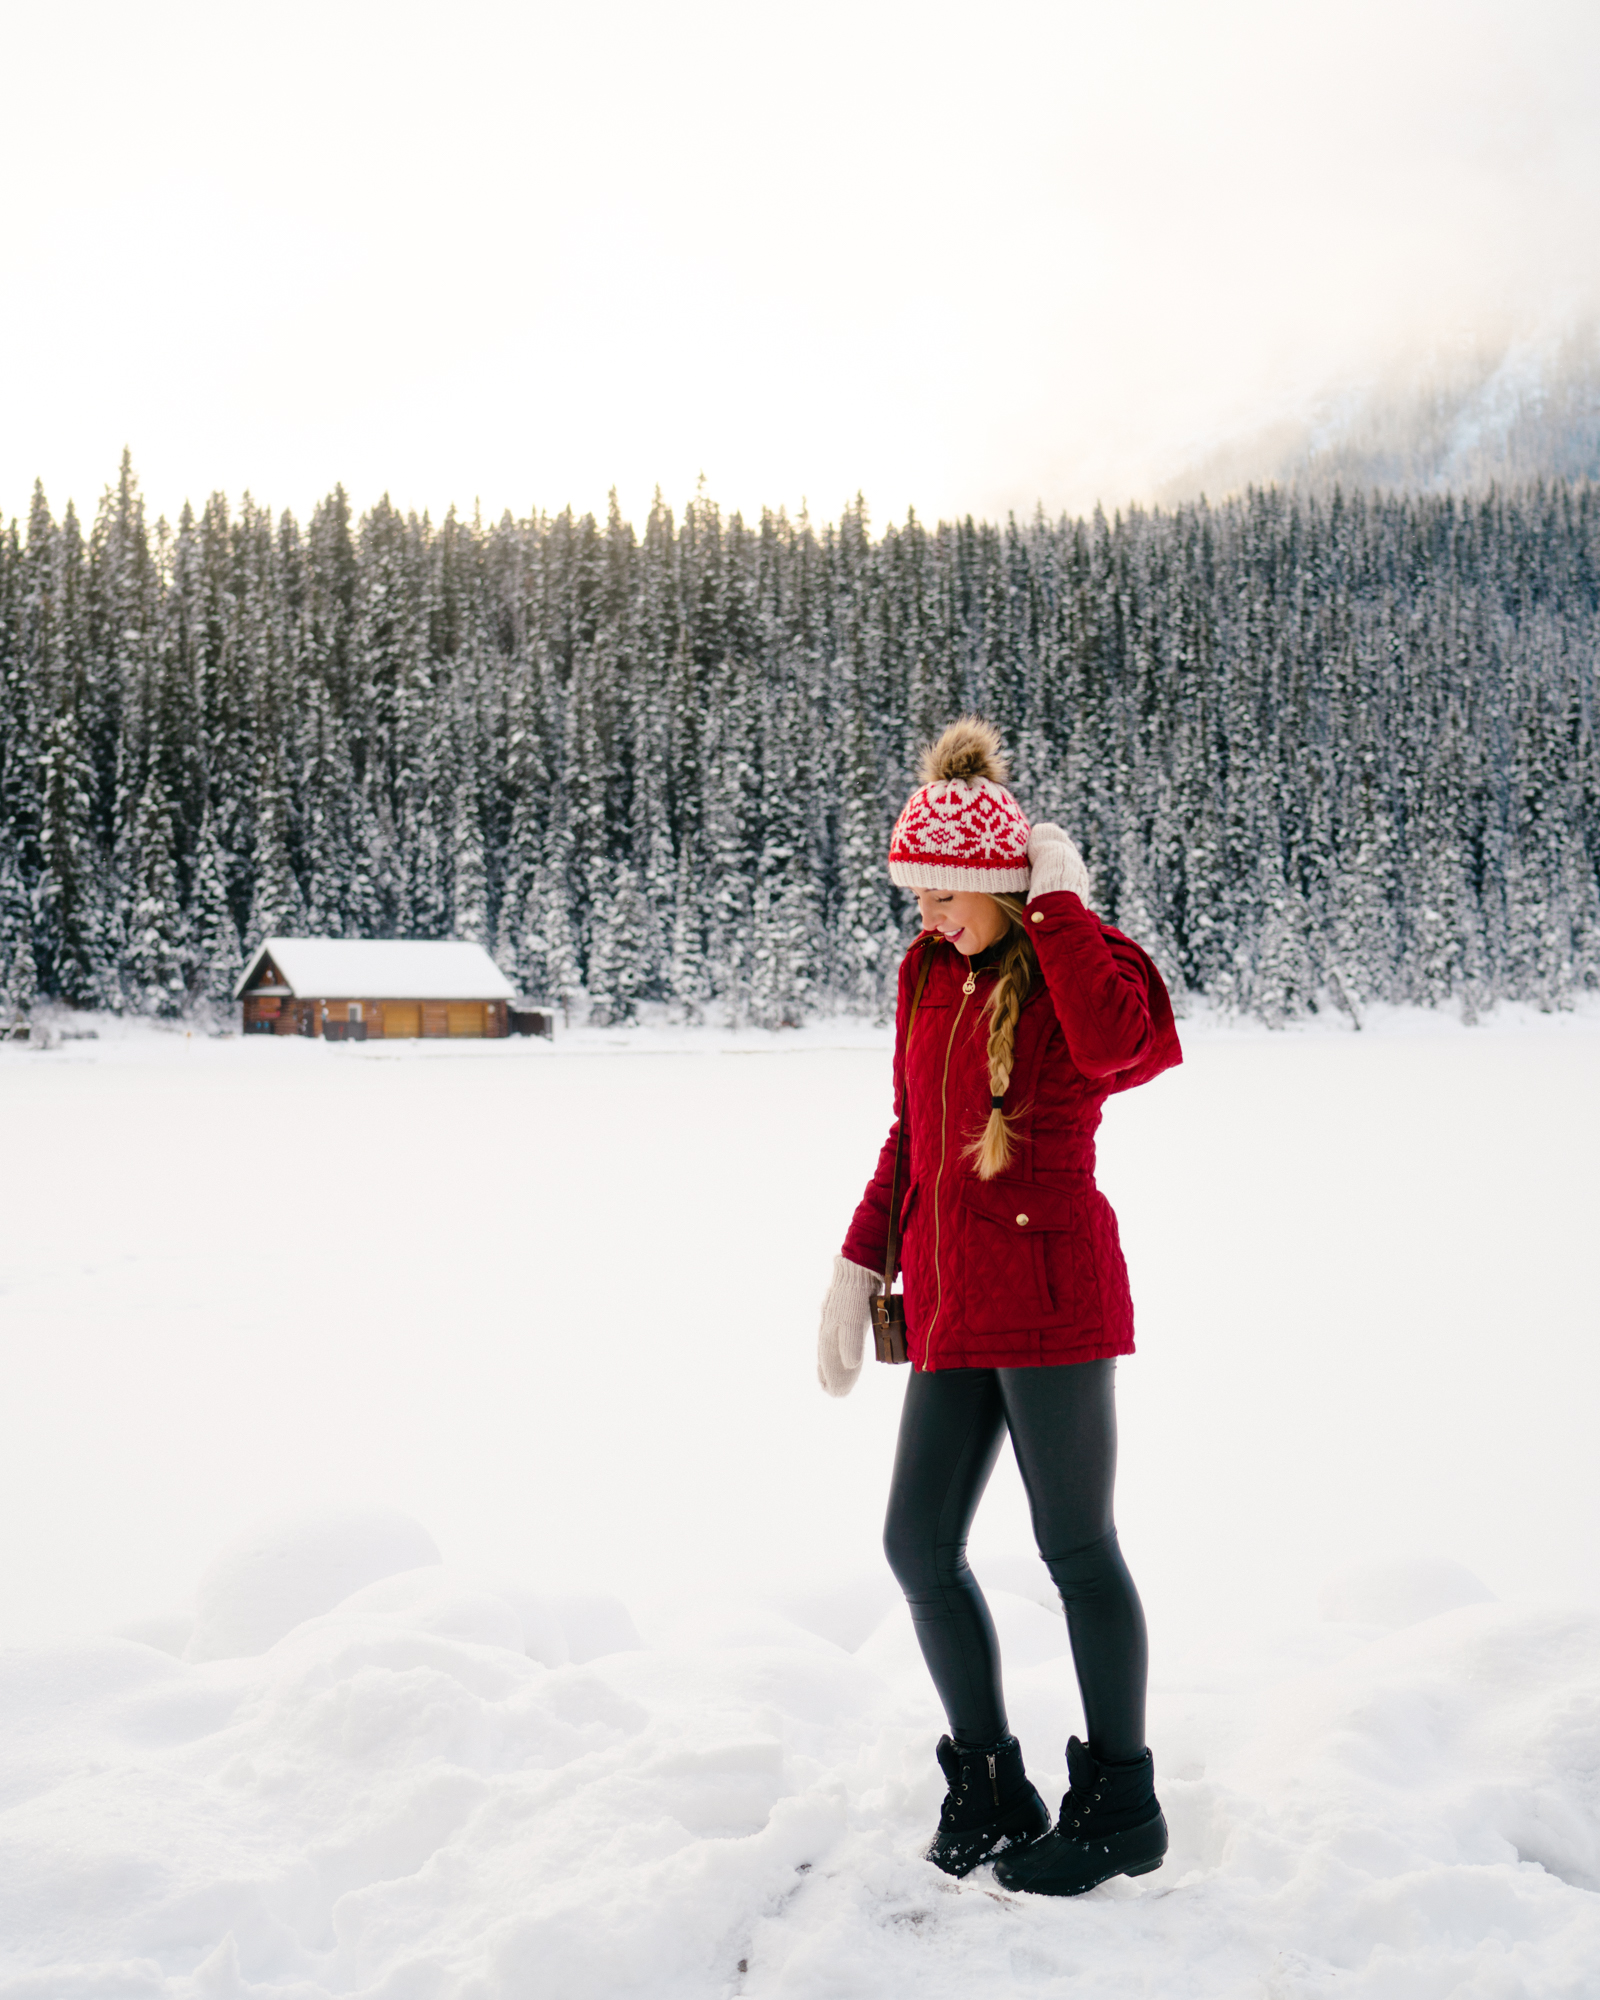 Red winter accessories